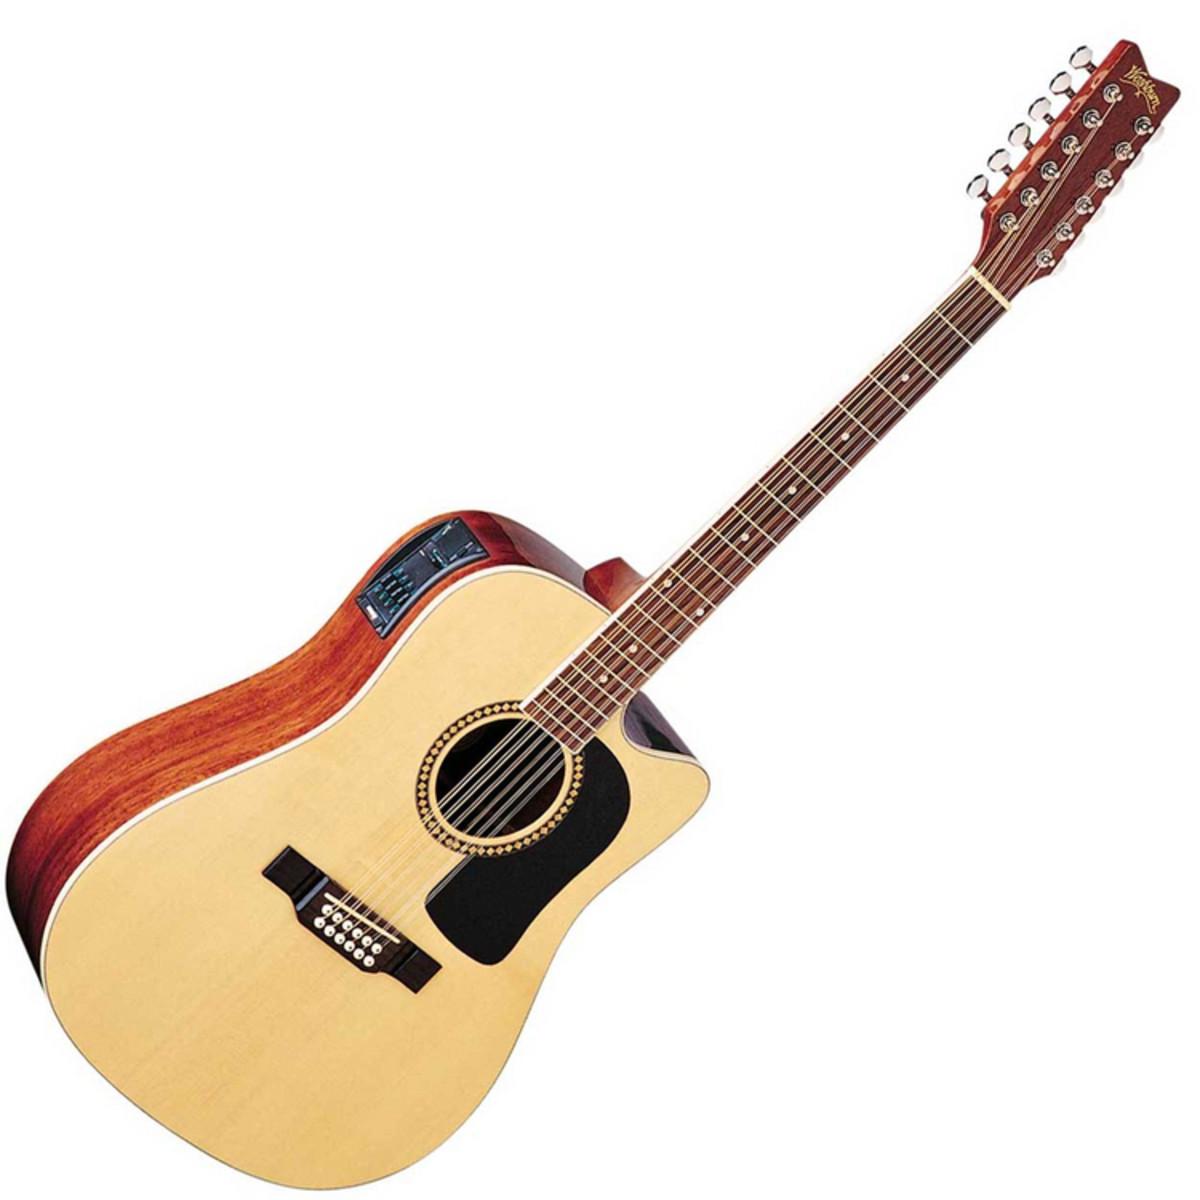 disc washburn d10sce 12 string electro acoustic guitar at. Black Bedroom Furniture Sets. Home Design Ideas